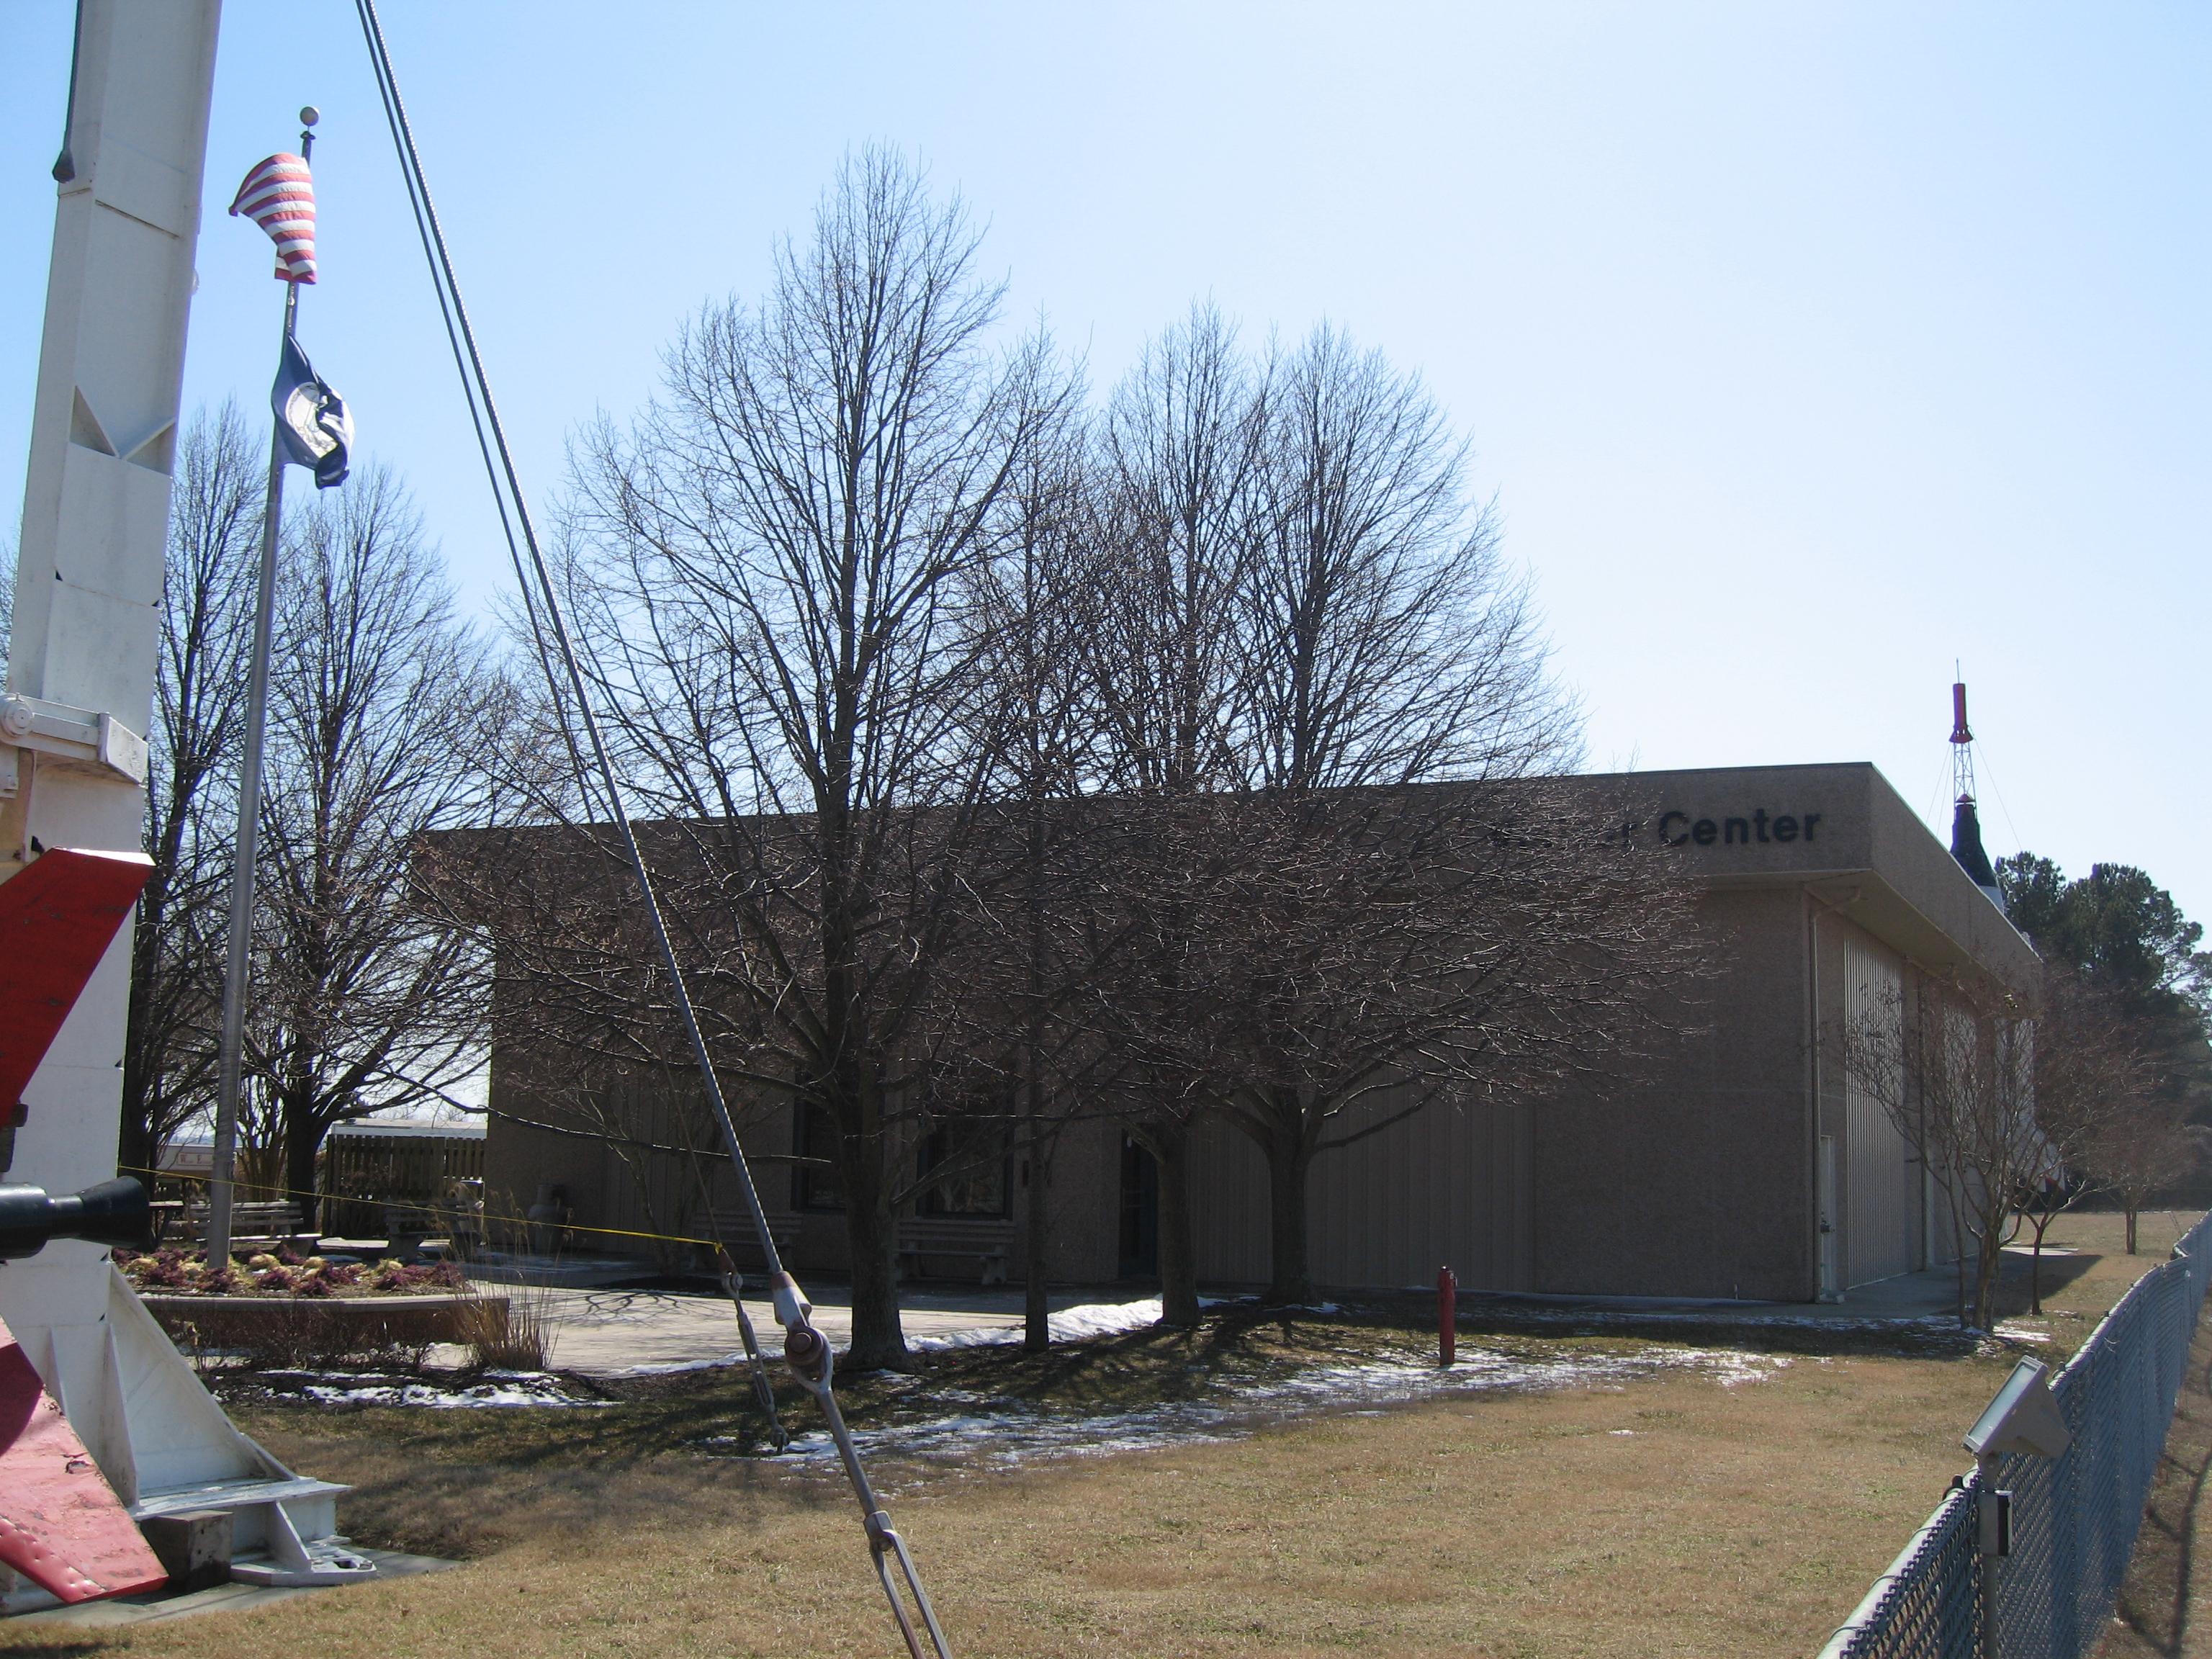 nasa wallops visitor center - photo #4